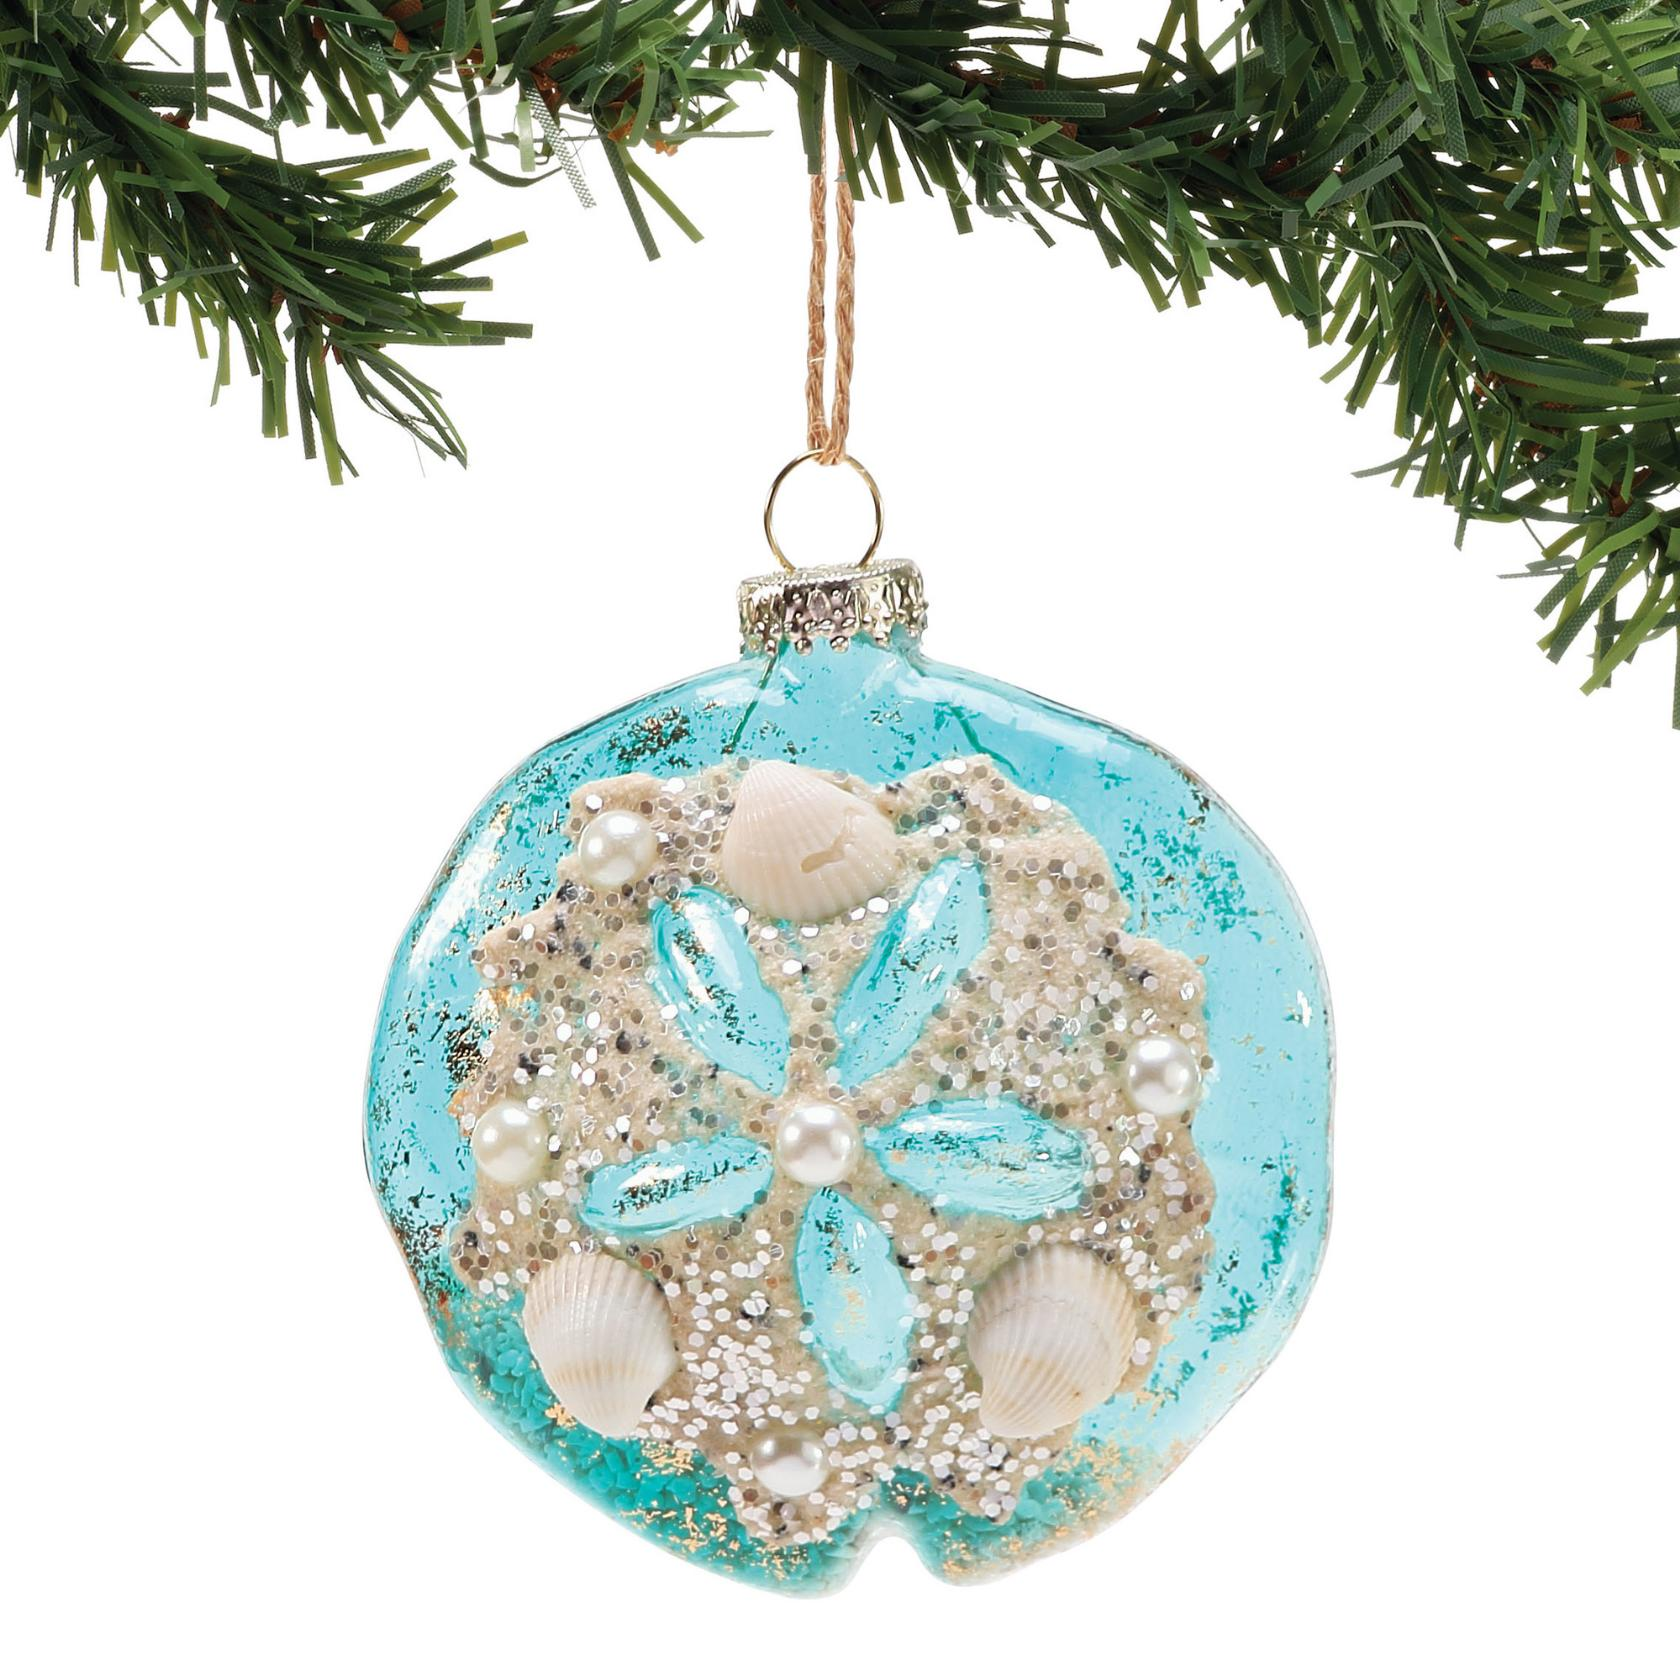 department 56 6002489 glass sand dollar ornament